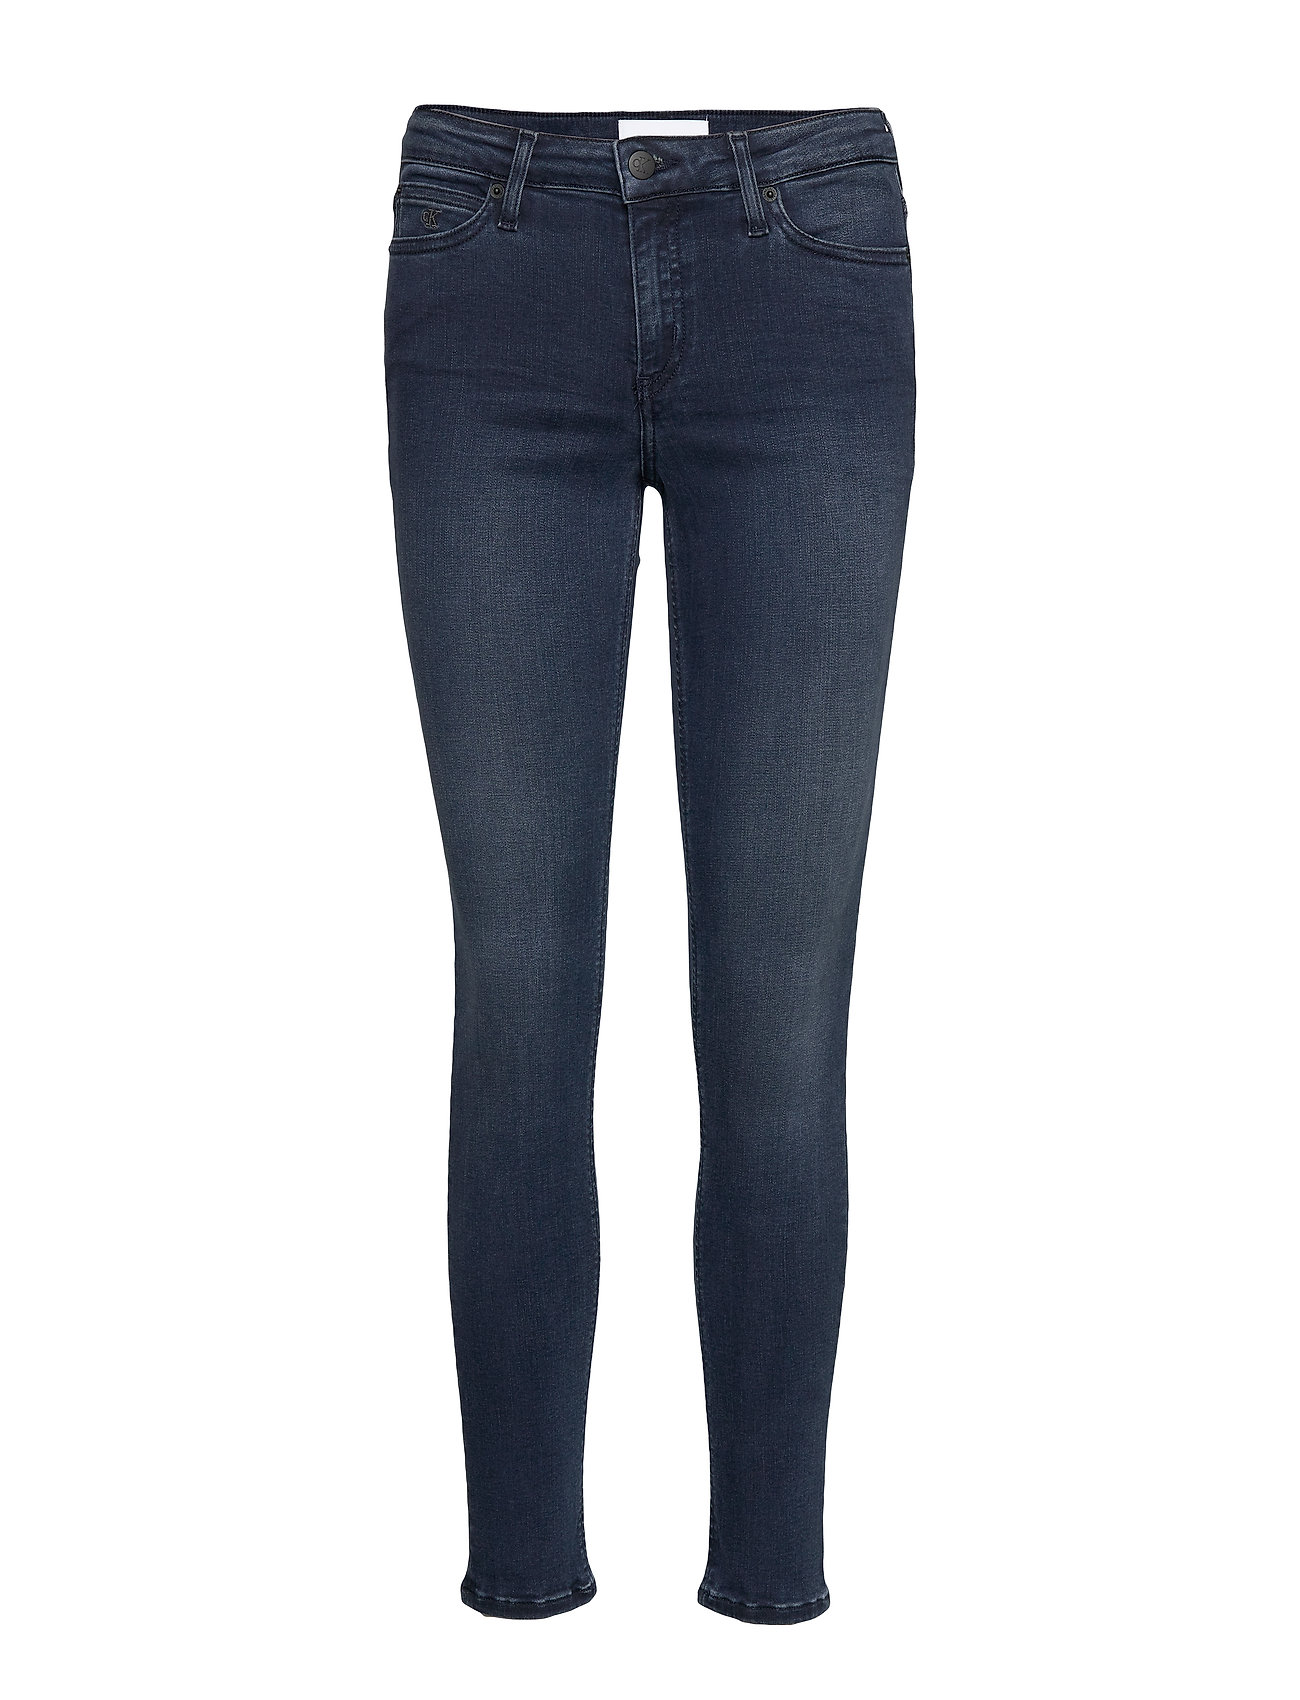 Calvin Klein Jeans CKJ 001 SUPER SKINNY - CA033 BLUE BLACK